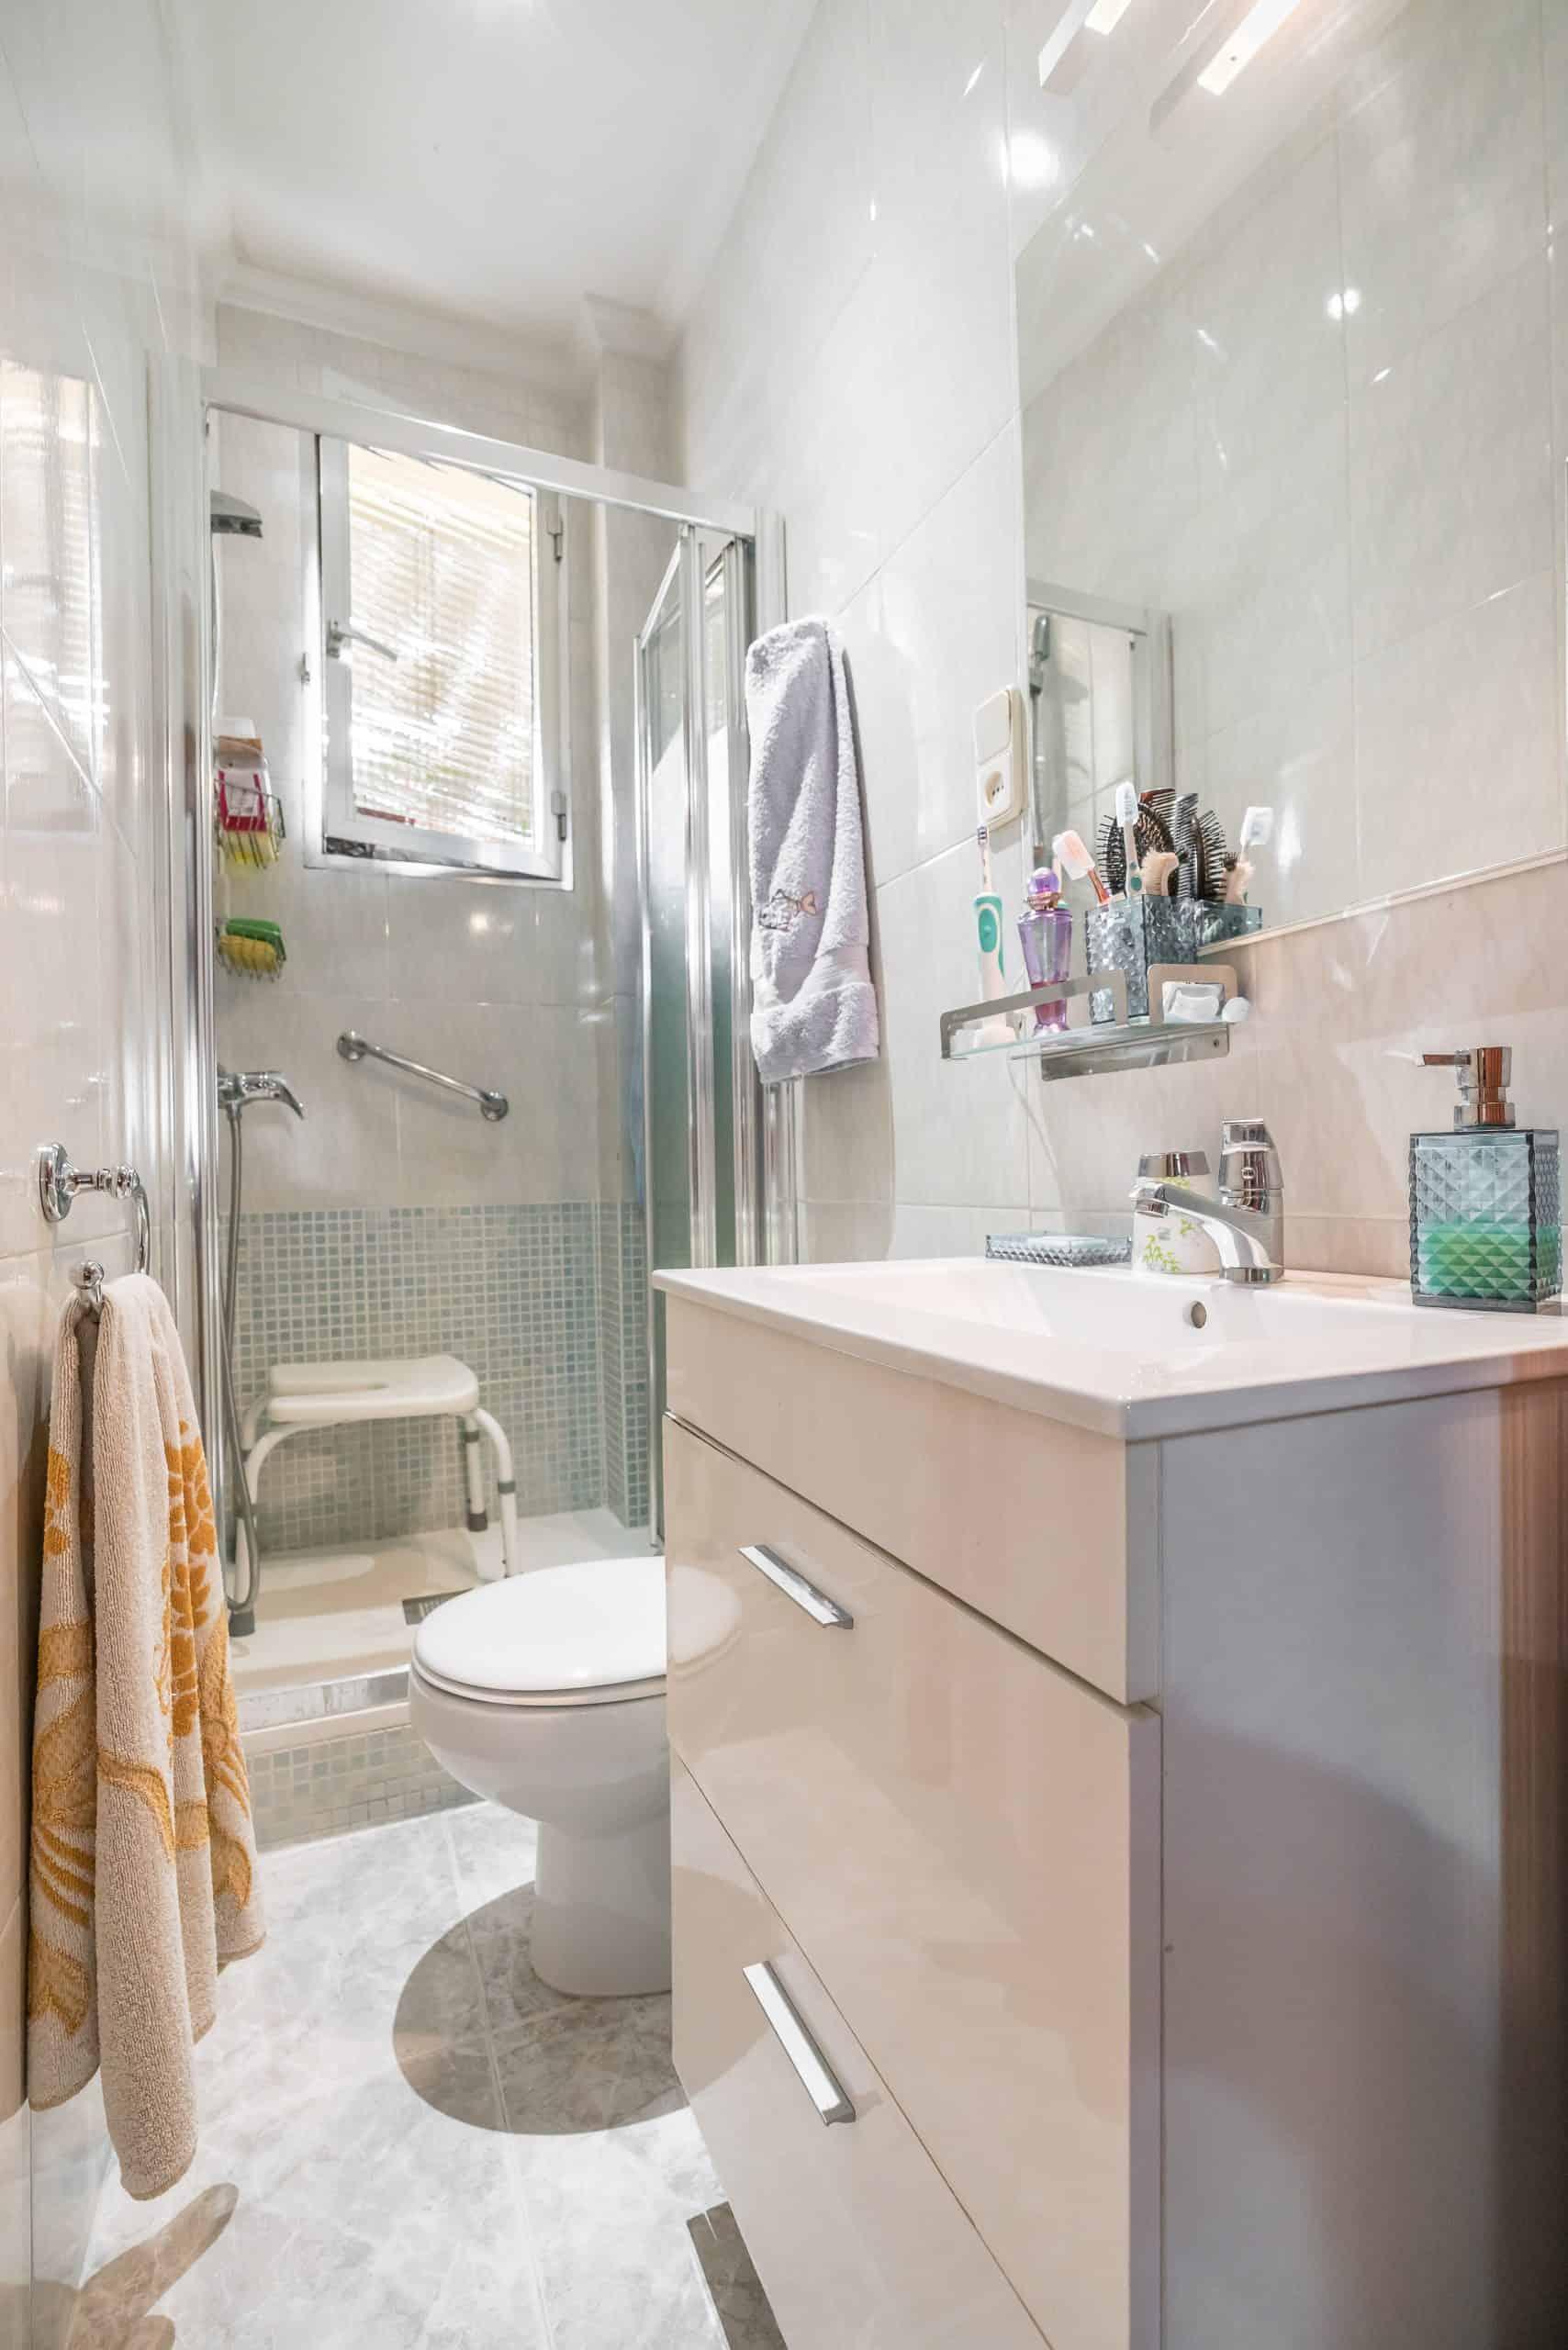 Agencia Inmobiliaria de Madrid-FUTUROCASA-Zona ARGANZUELA-EMBAJADORES-LEGAZPI3 BAÑO1 (6)